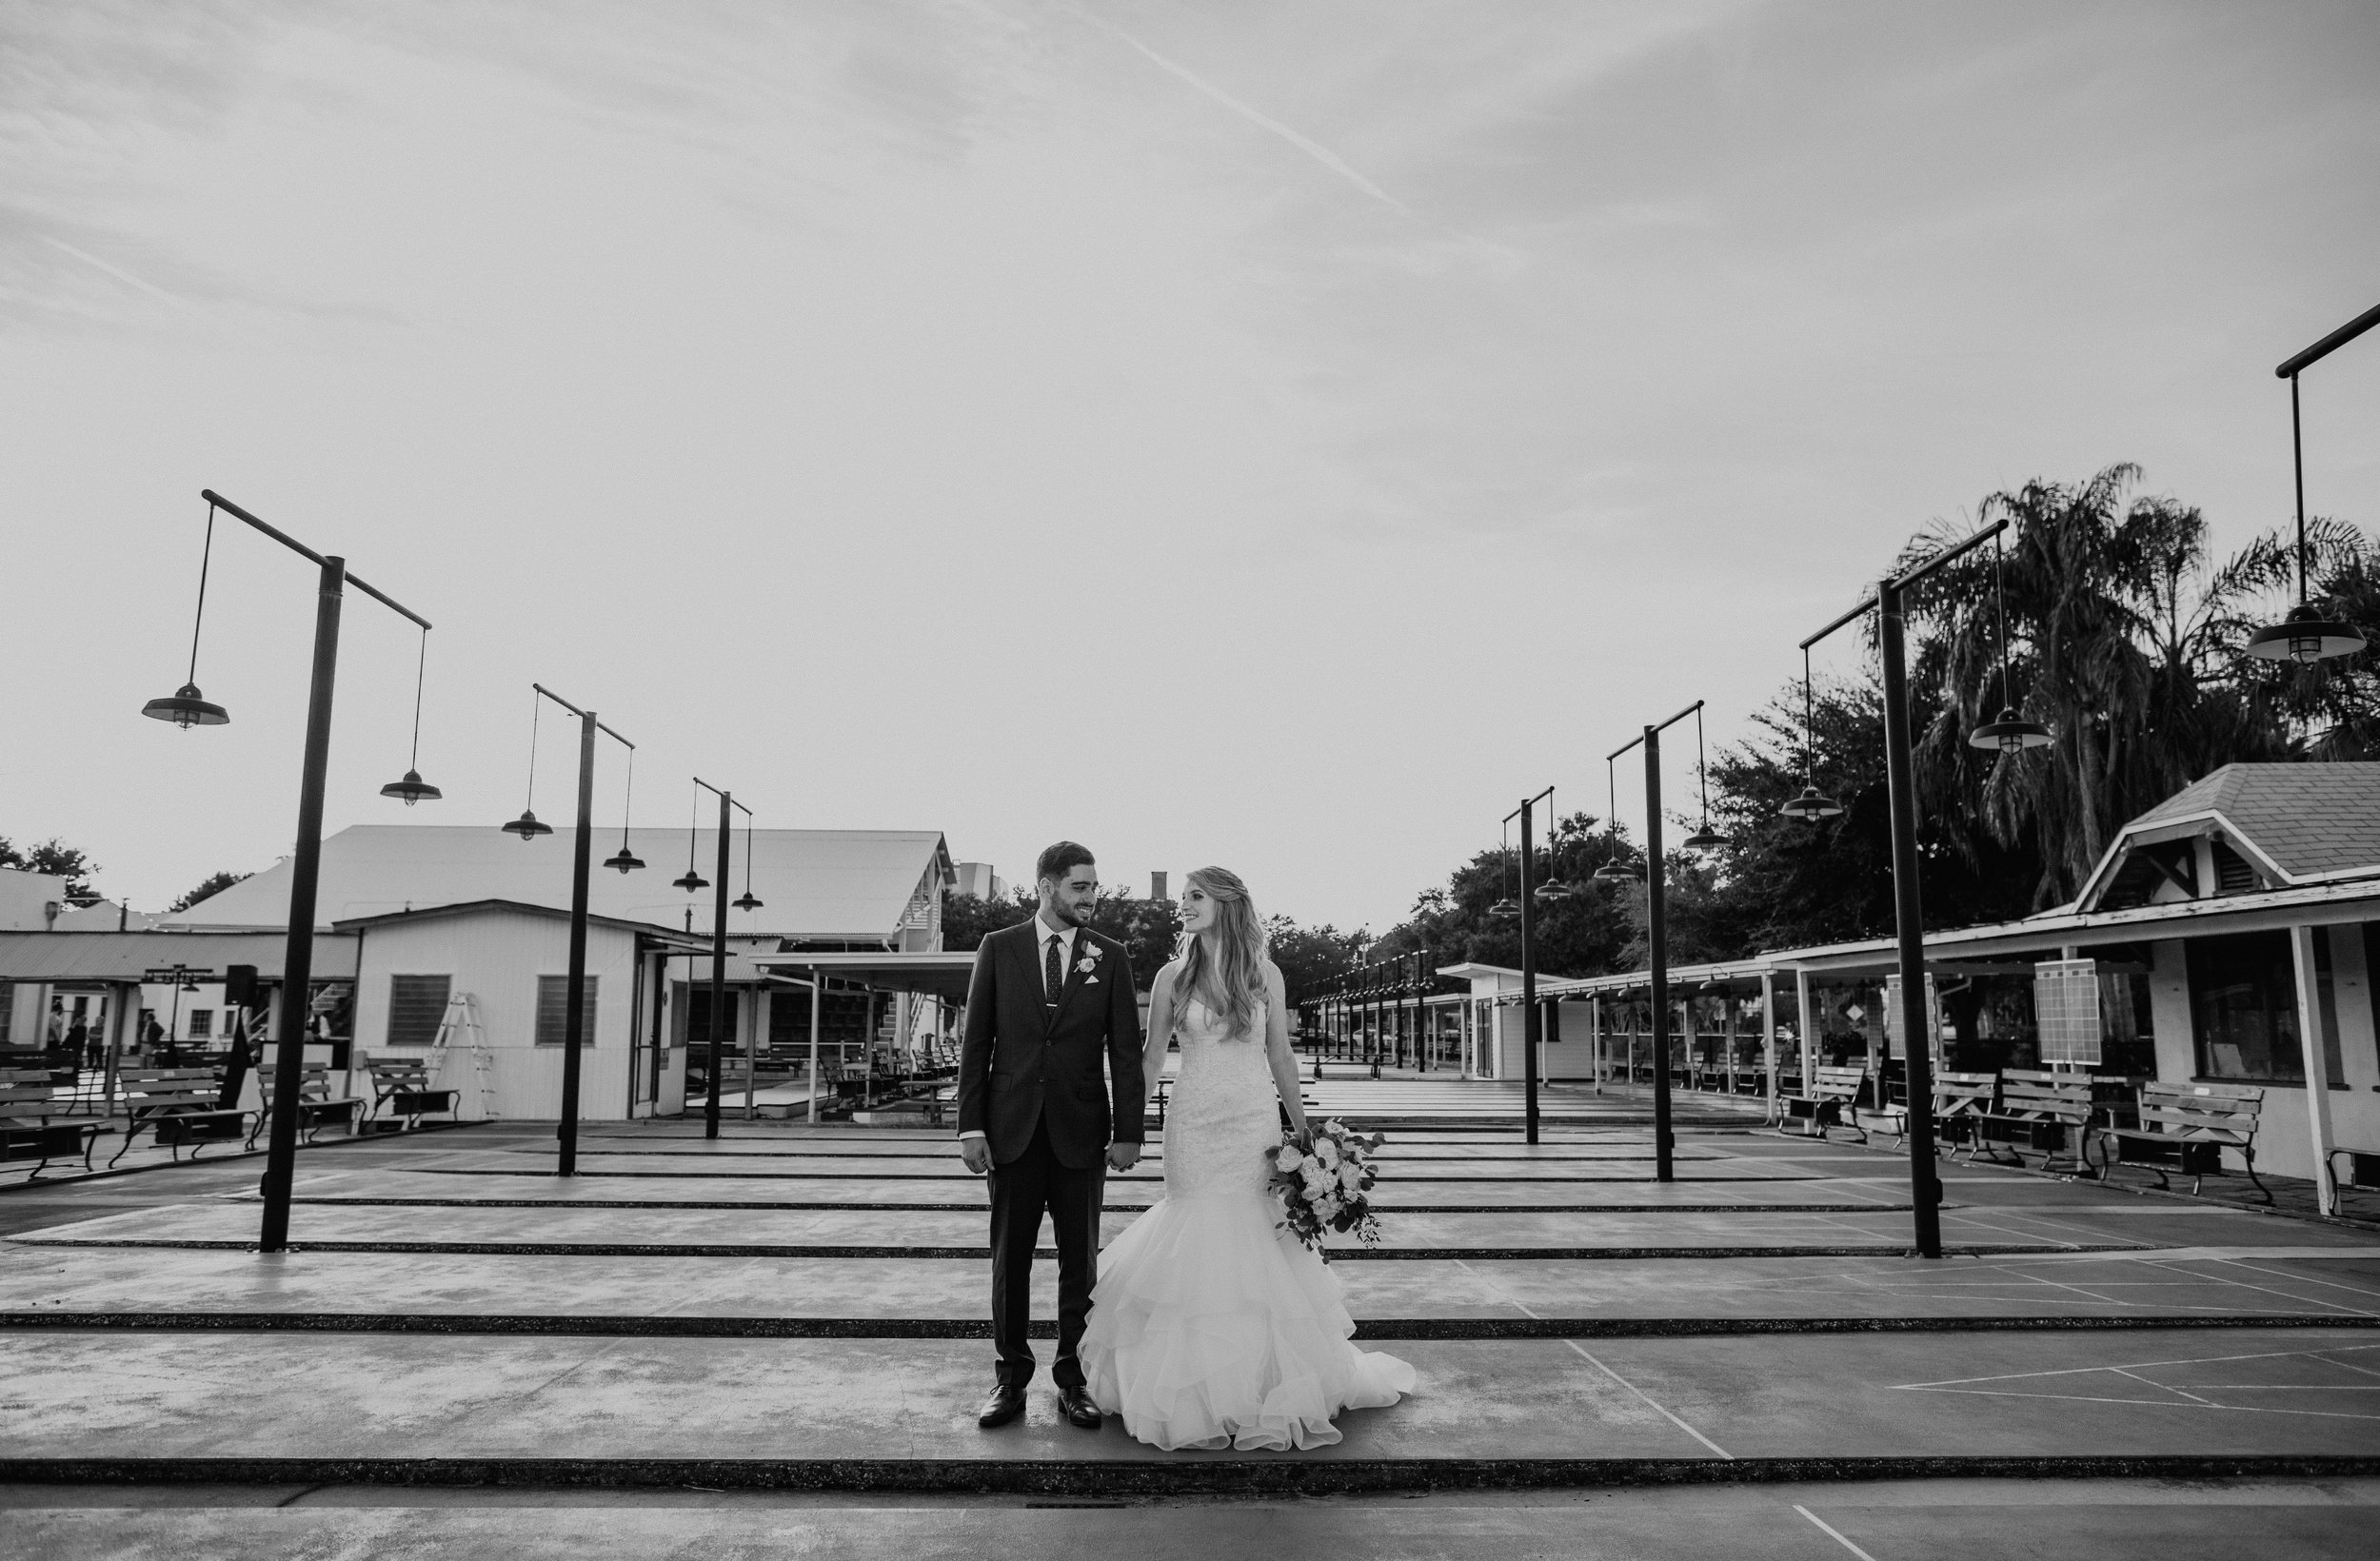 St Petersburg Shuffleboard Club St Petersburg Florida-Wedding- Rachel and Michael93.JPG